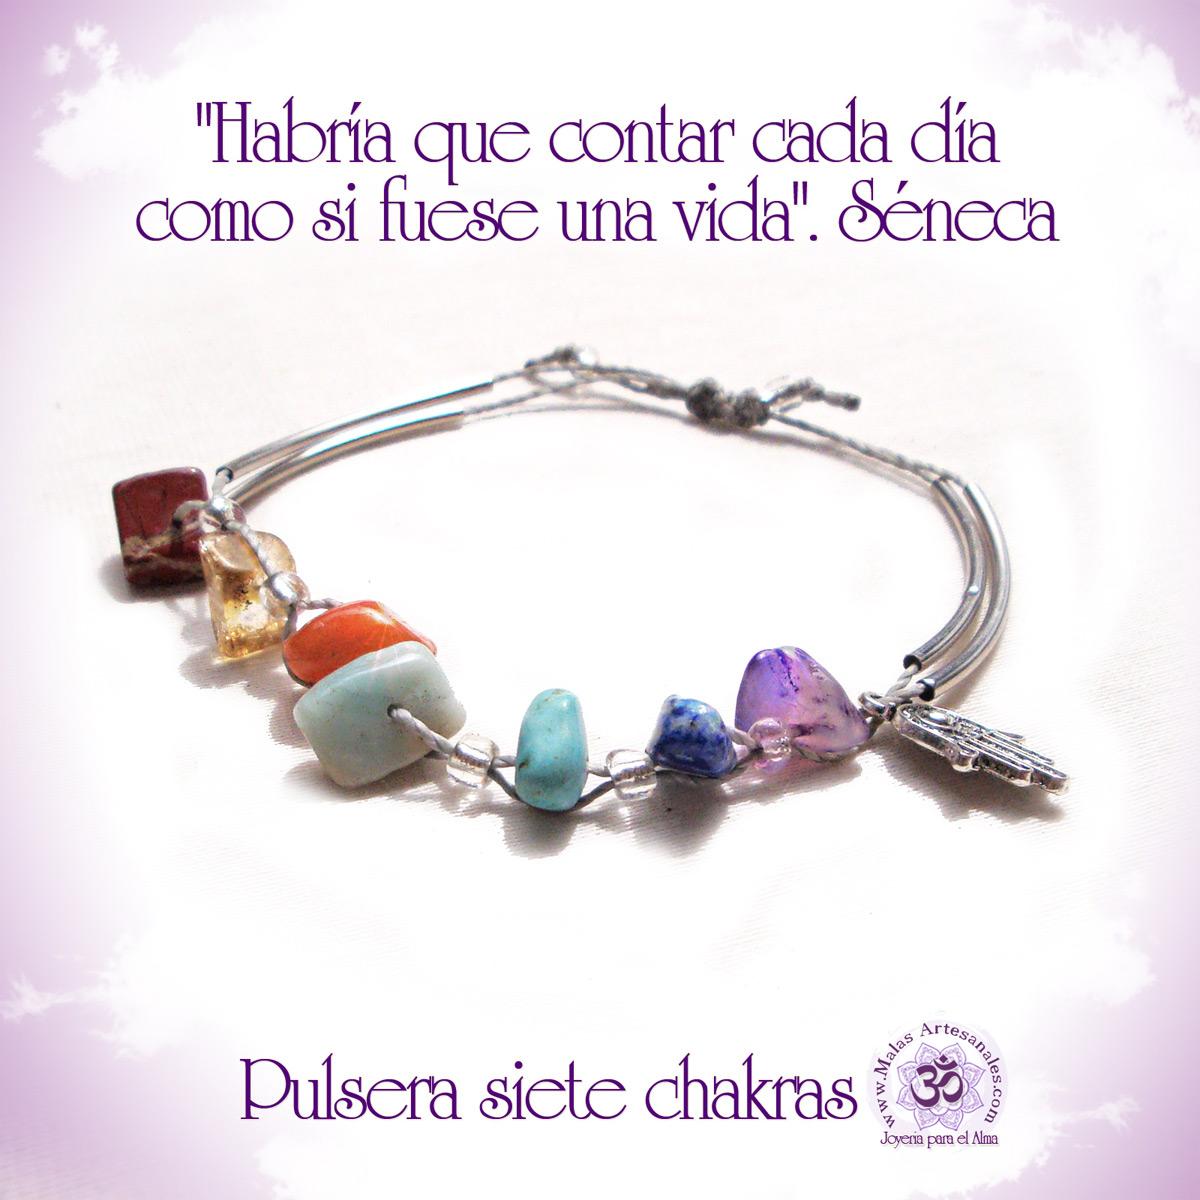 pulsera_espiritual_artesanal_siete_chakras_equilibrio_alegria